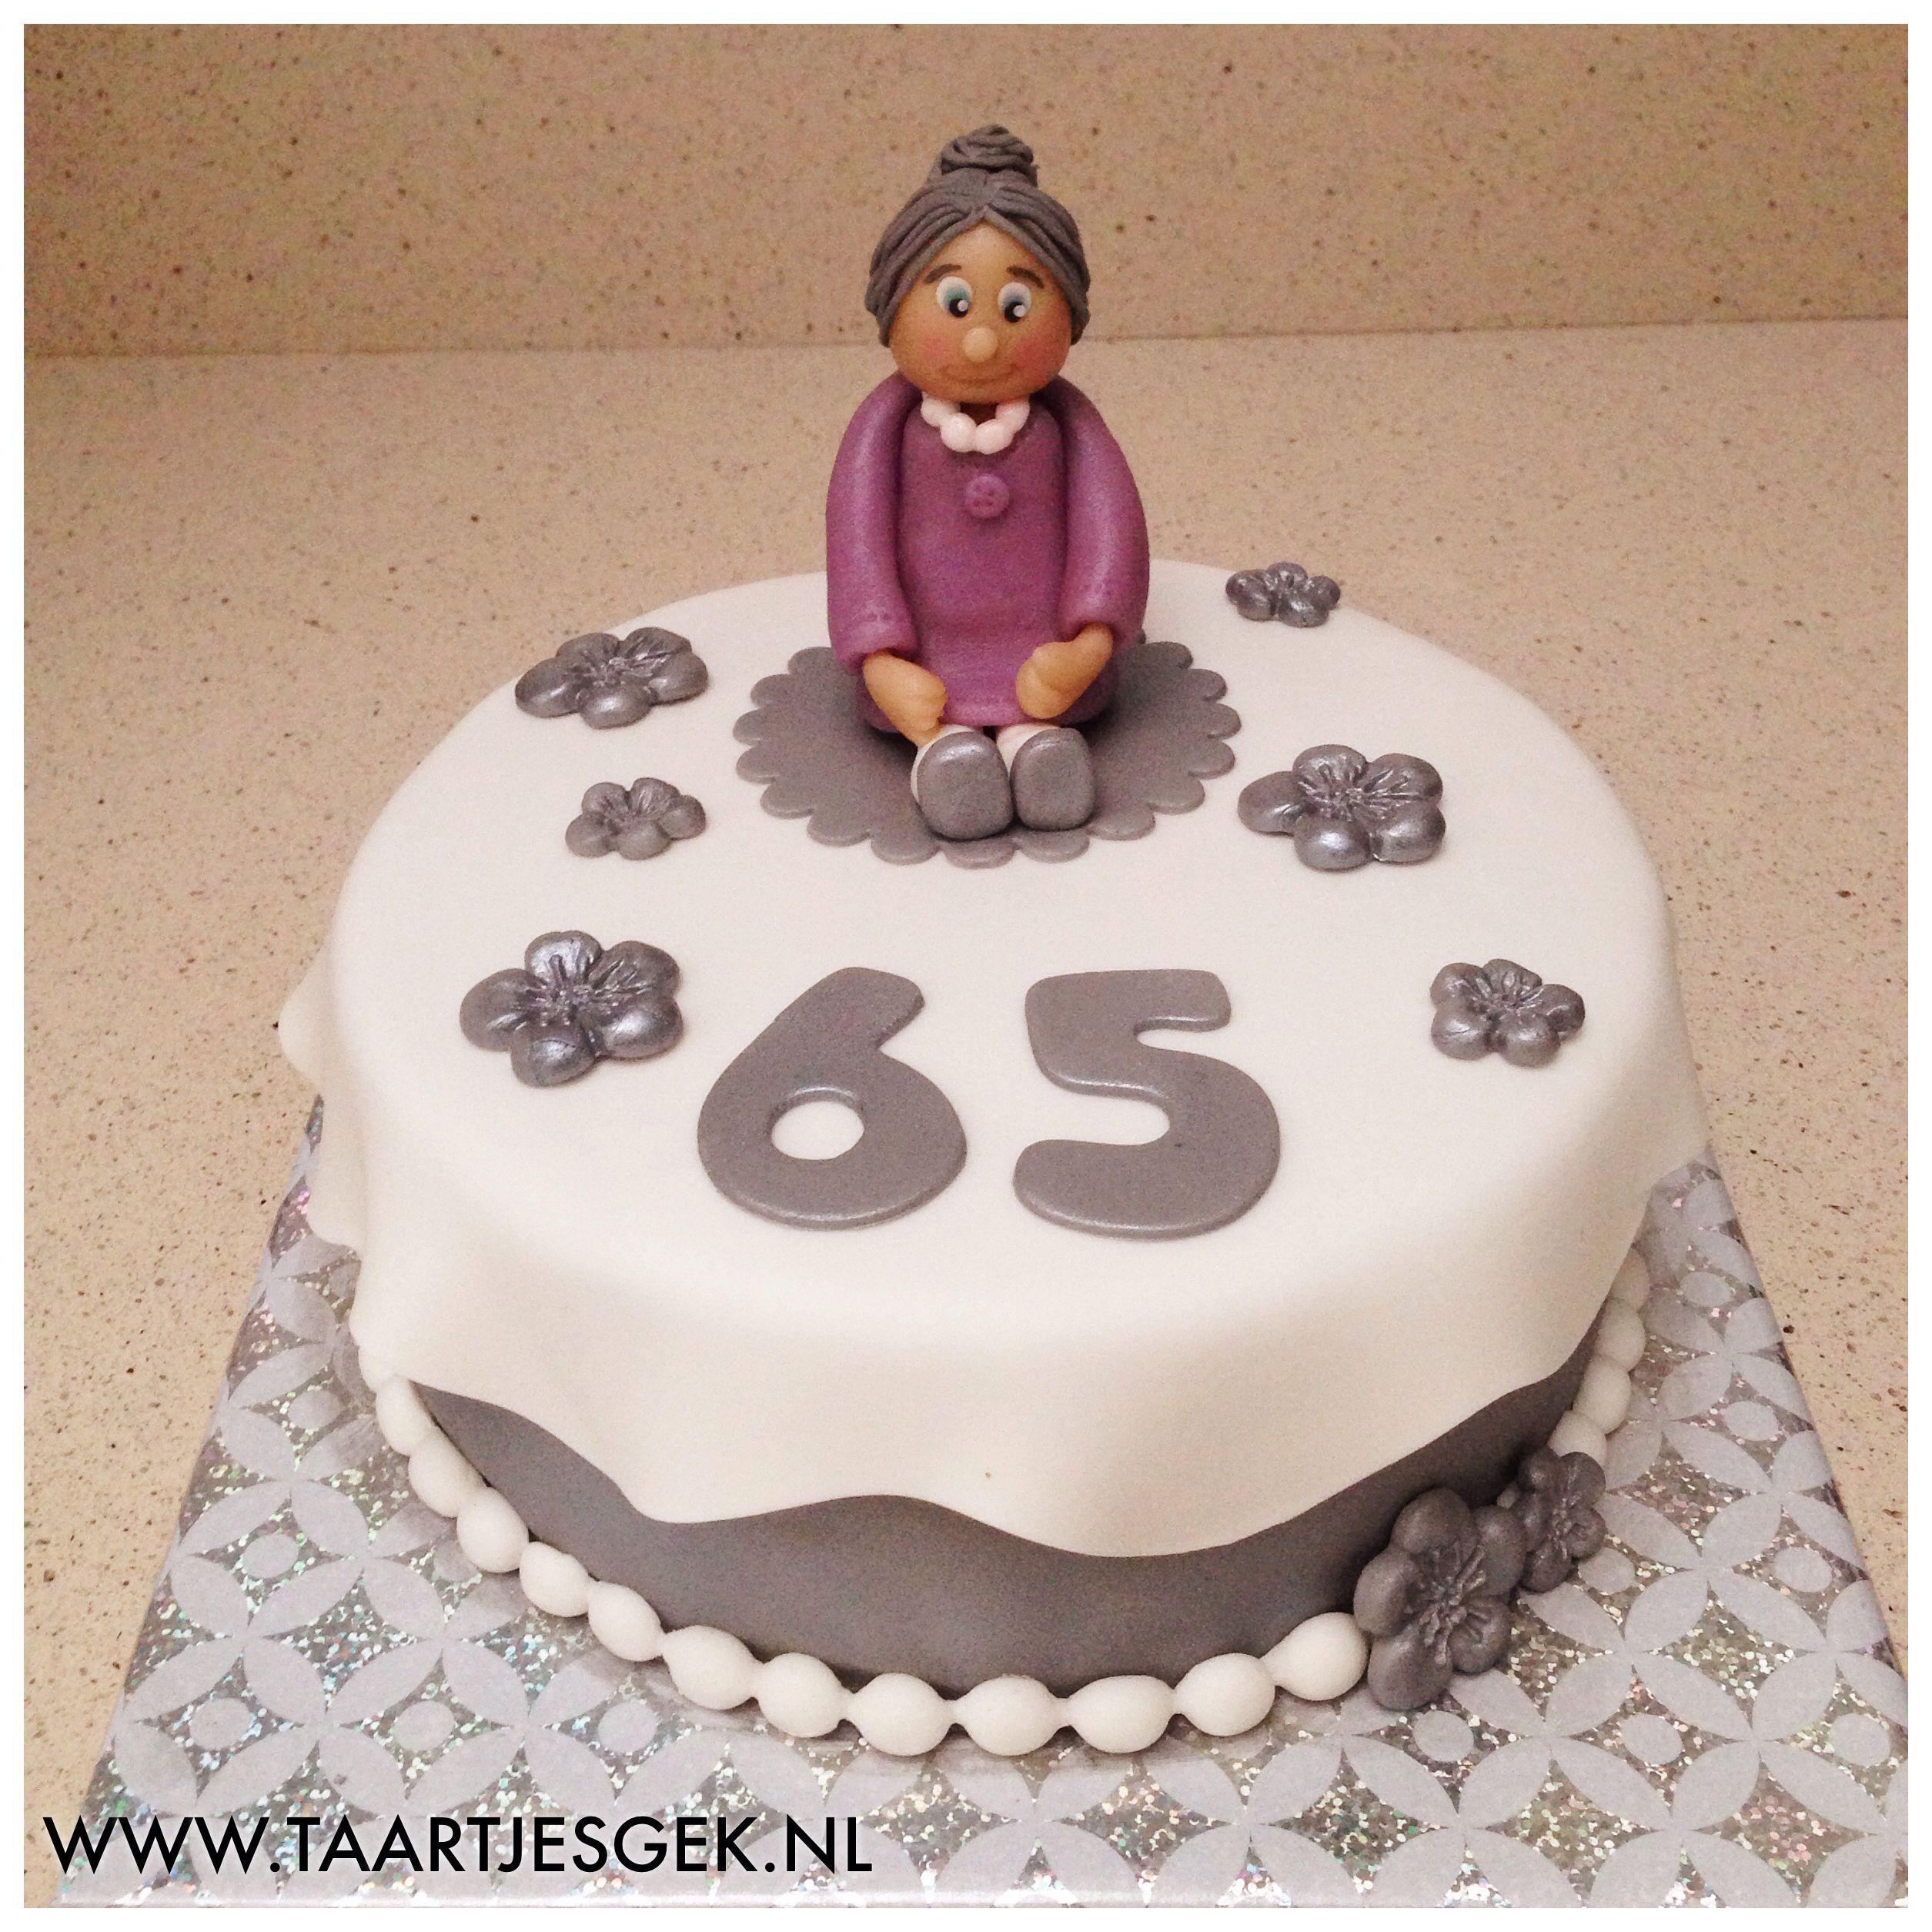 Granny cake my cakes pinterest cake grandma cake for What to buy grandmother for birthday